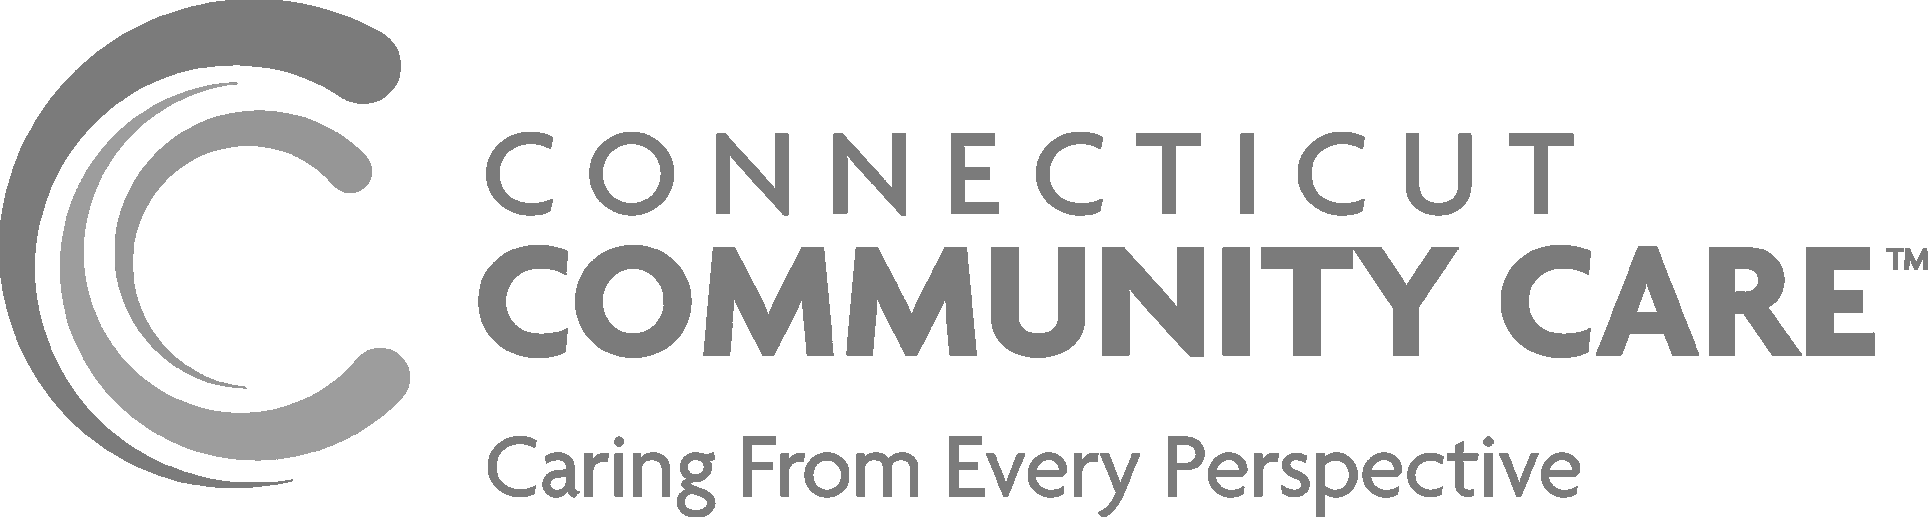 connecticut community care